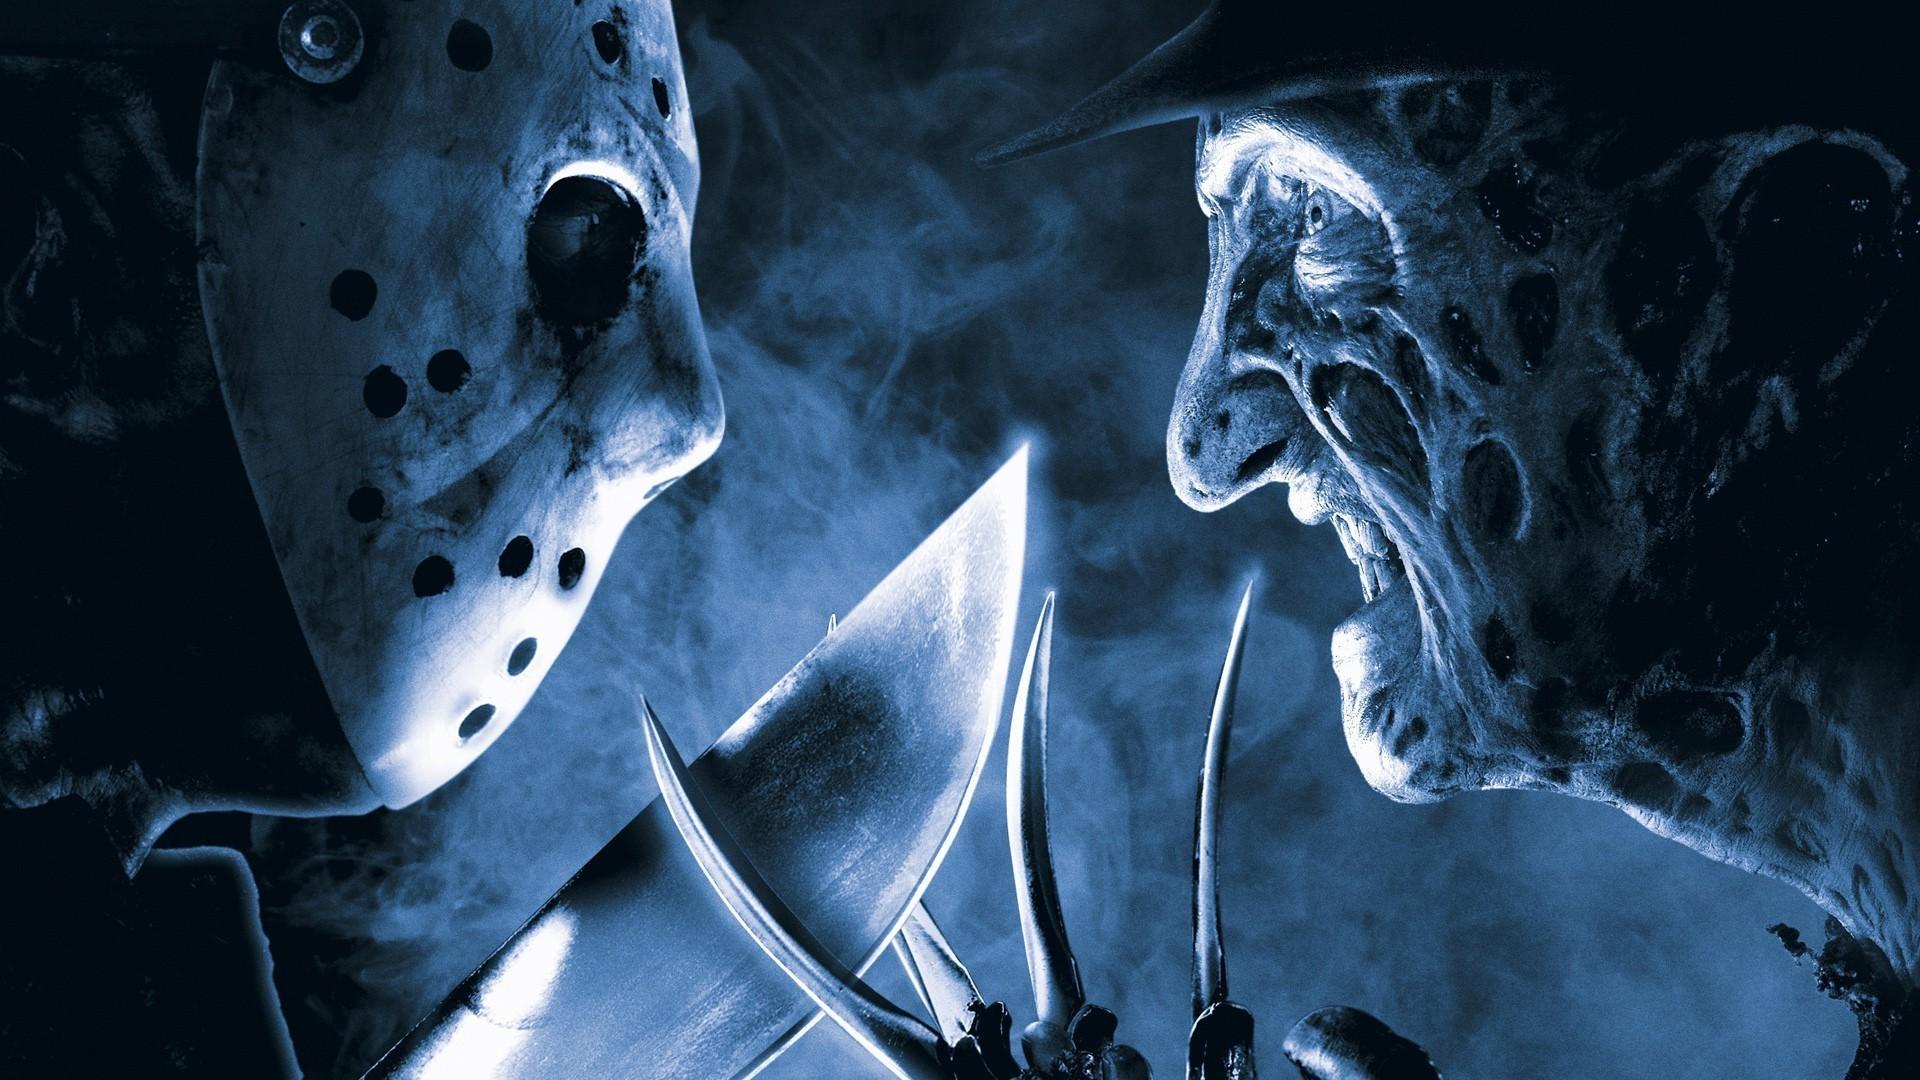 Freddy Krueger Wallpaper 61 Pictures